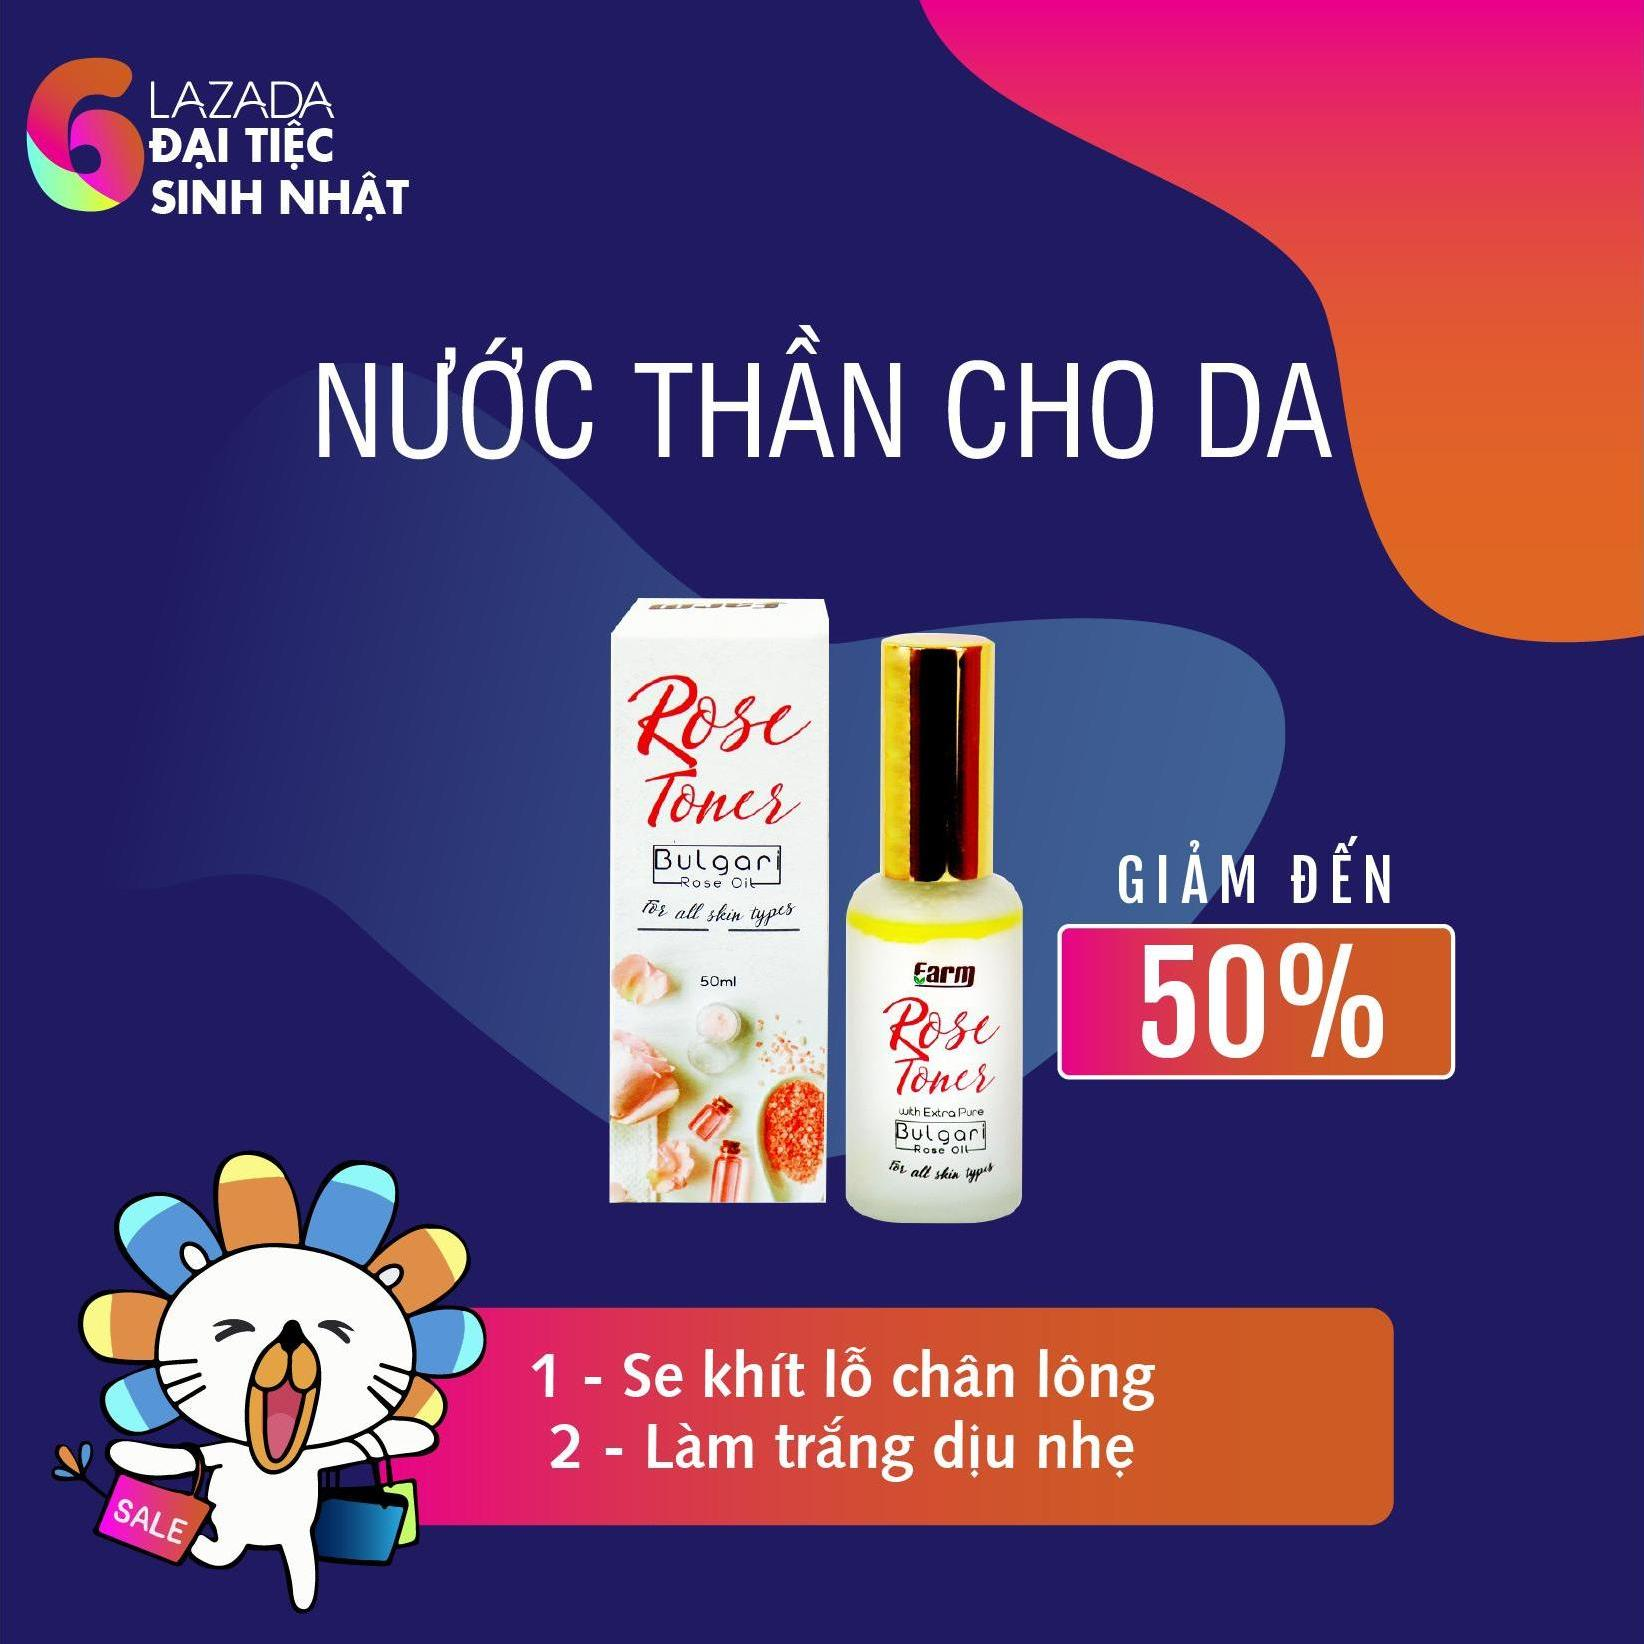 Giá Bán Nước Hoa Hồng Farm Trong Hồ Chí Minh